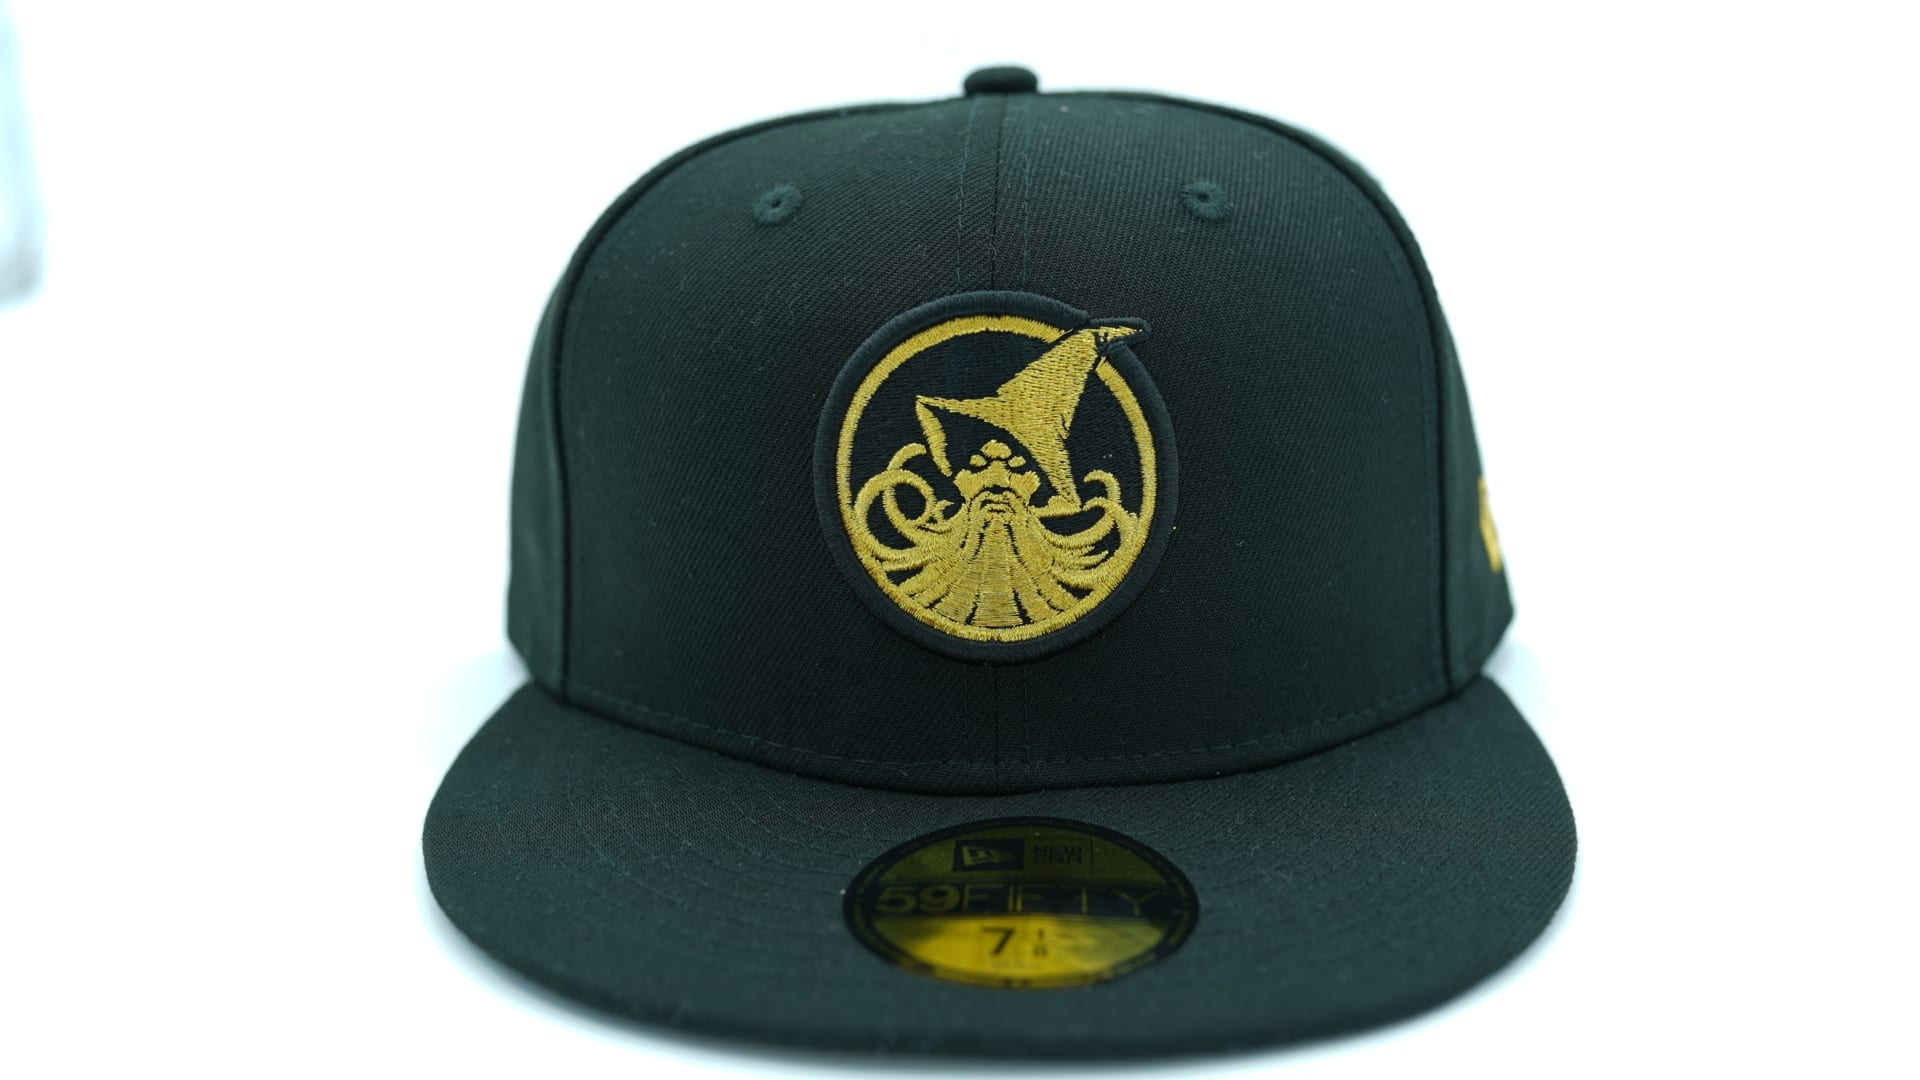 zephyr-93-fitted-baseball-cap